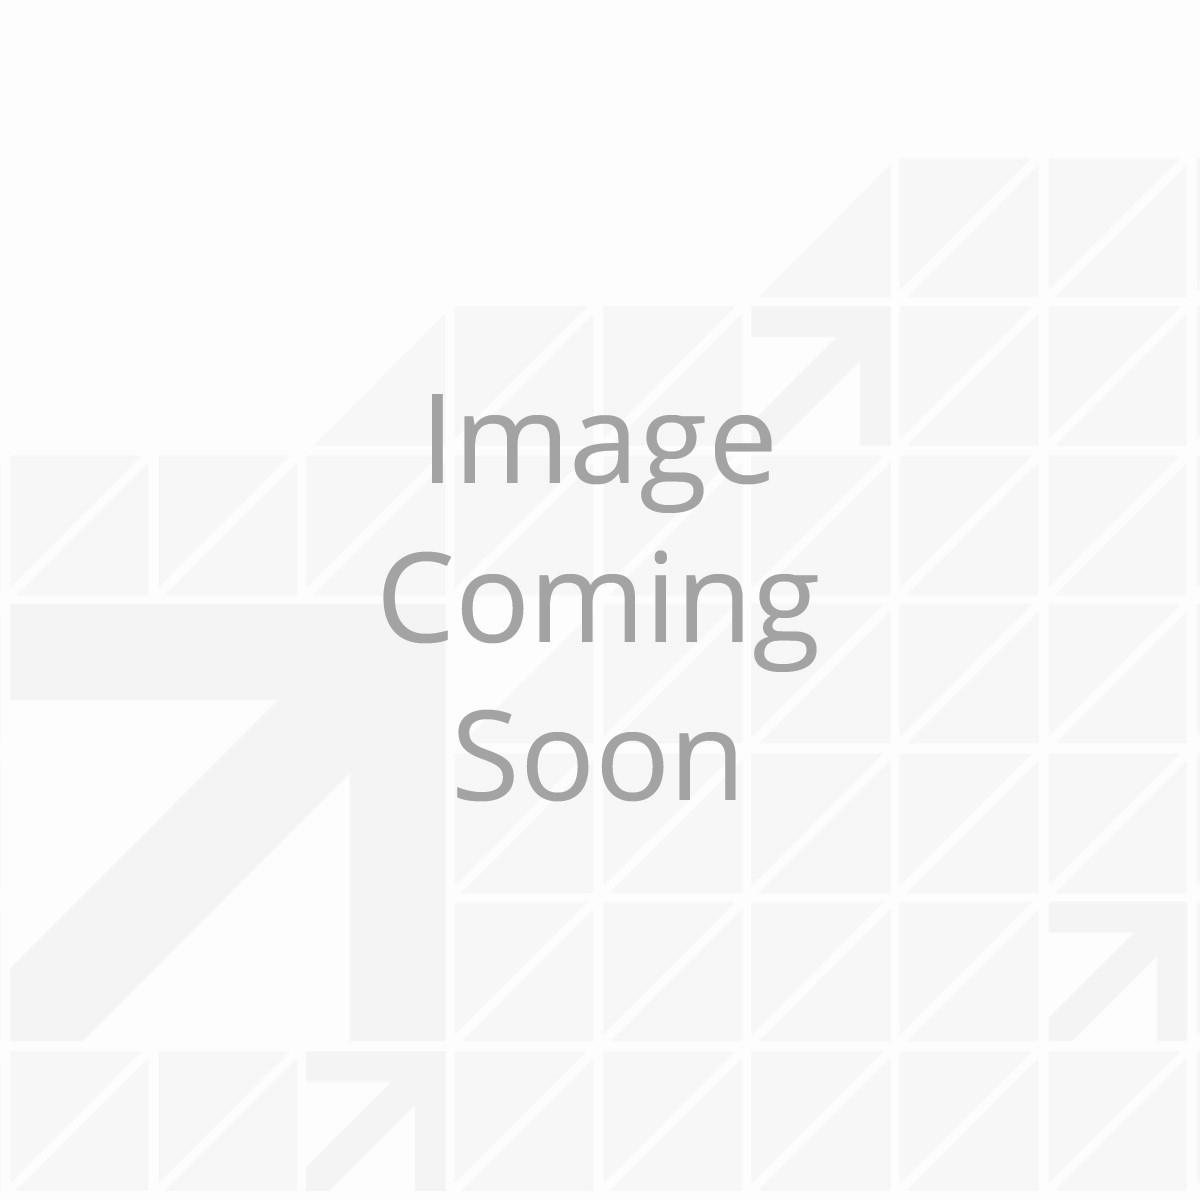 "5-7/8"" x 5-3/8"" x 3-1/2"" Breakaway Battery Case with Lockable Bar"